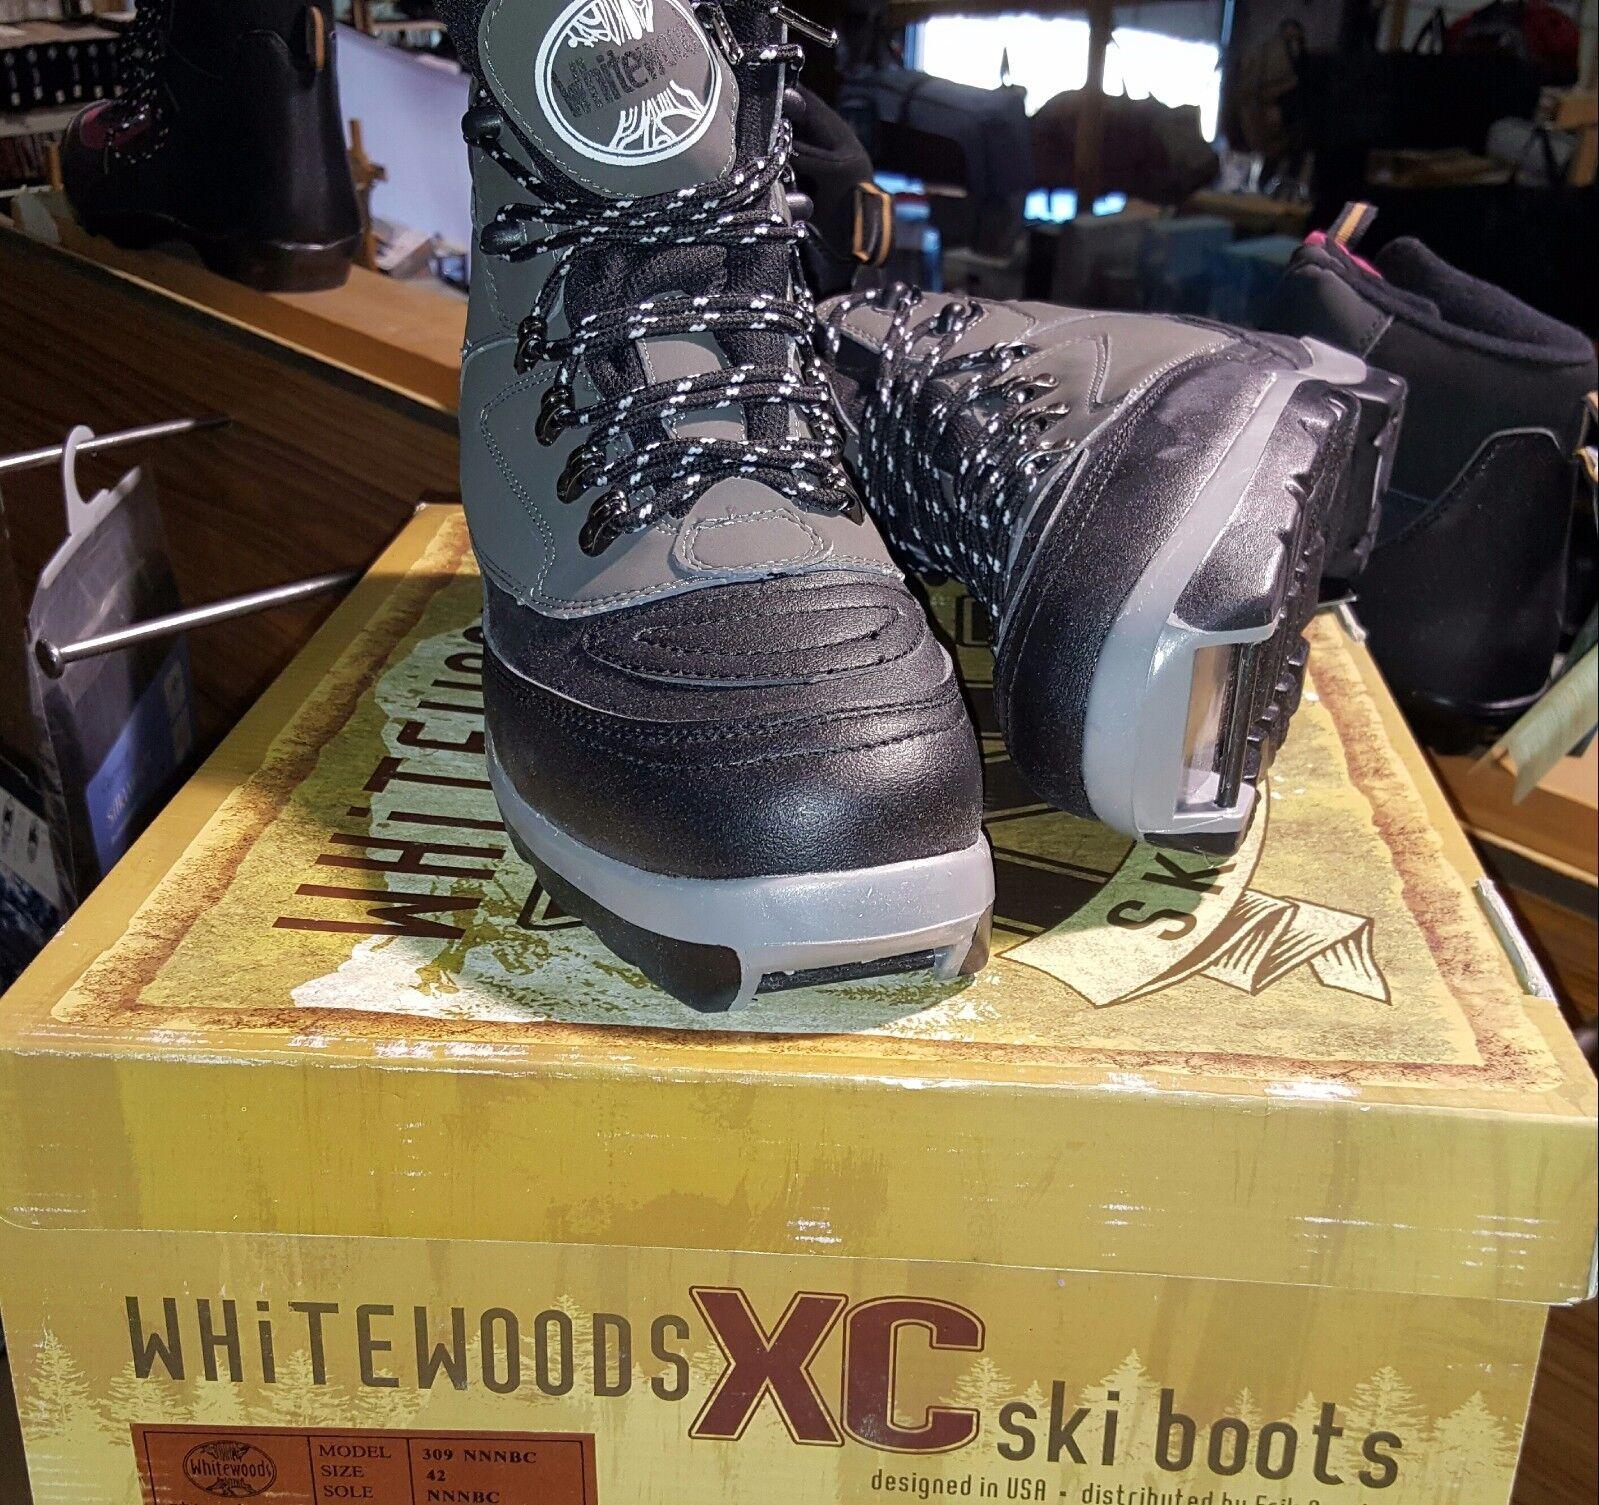 Cross Country, Ski Stiefel, 309 NNNBC, NNNBC, 309 Größe: 38 df5485